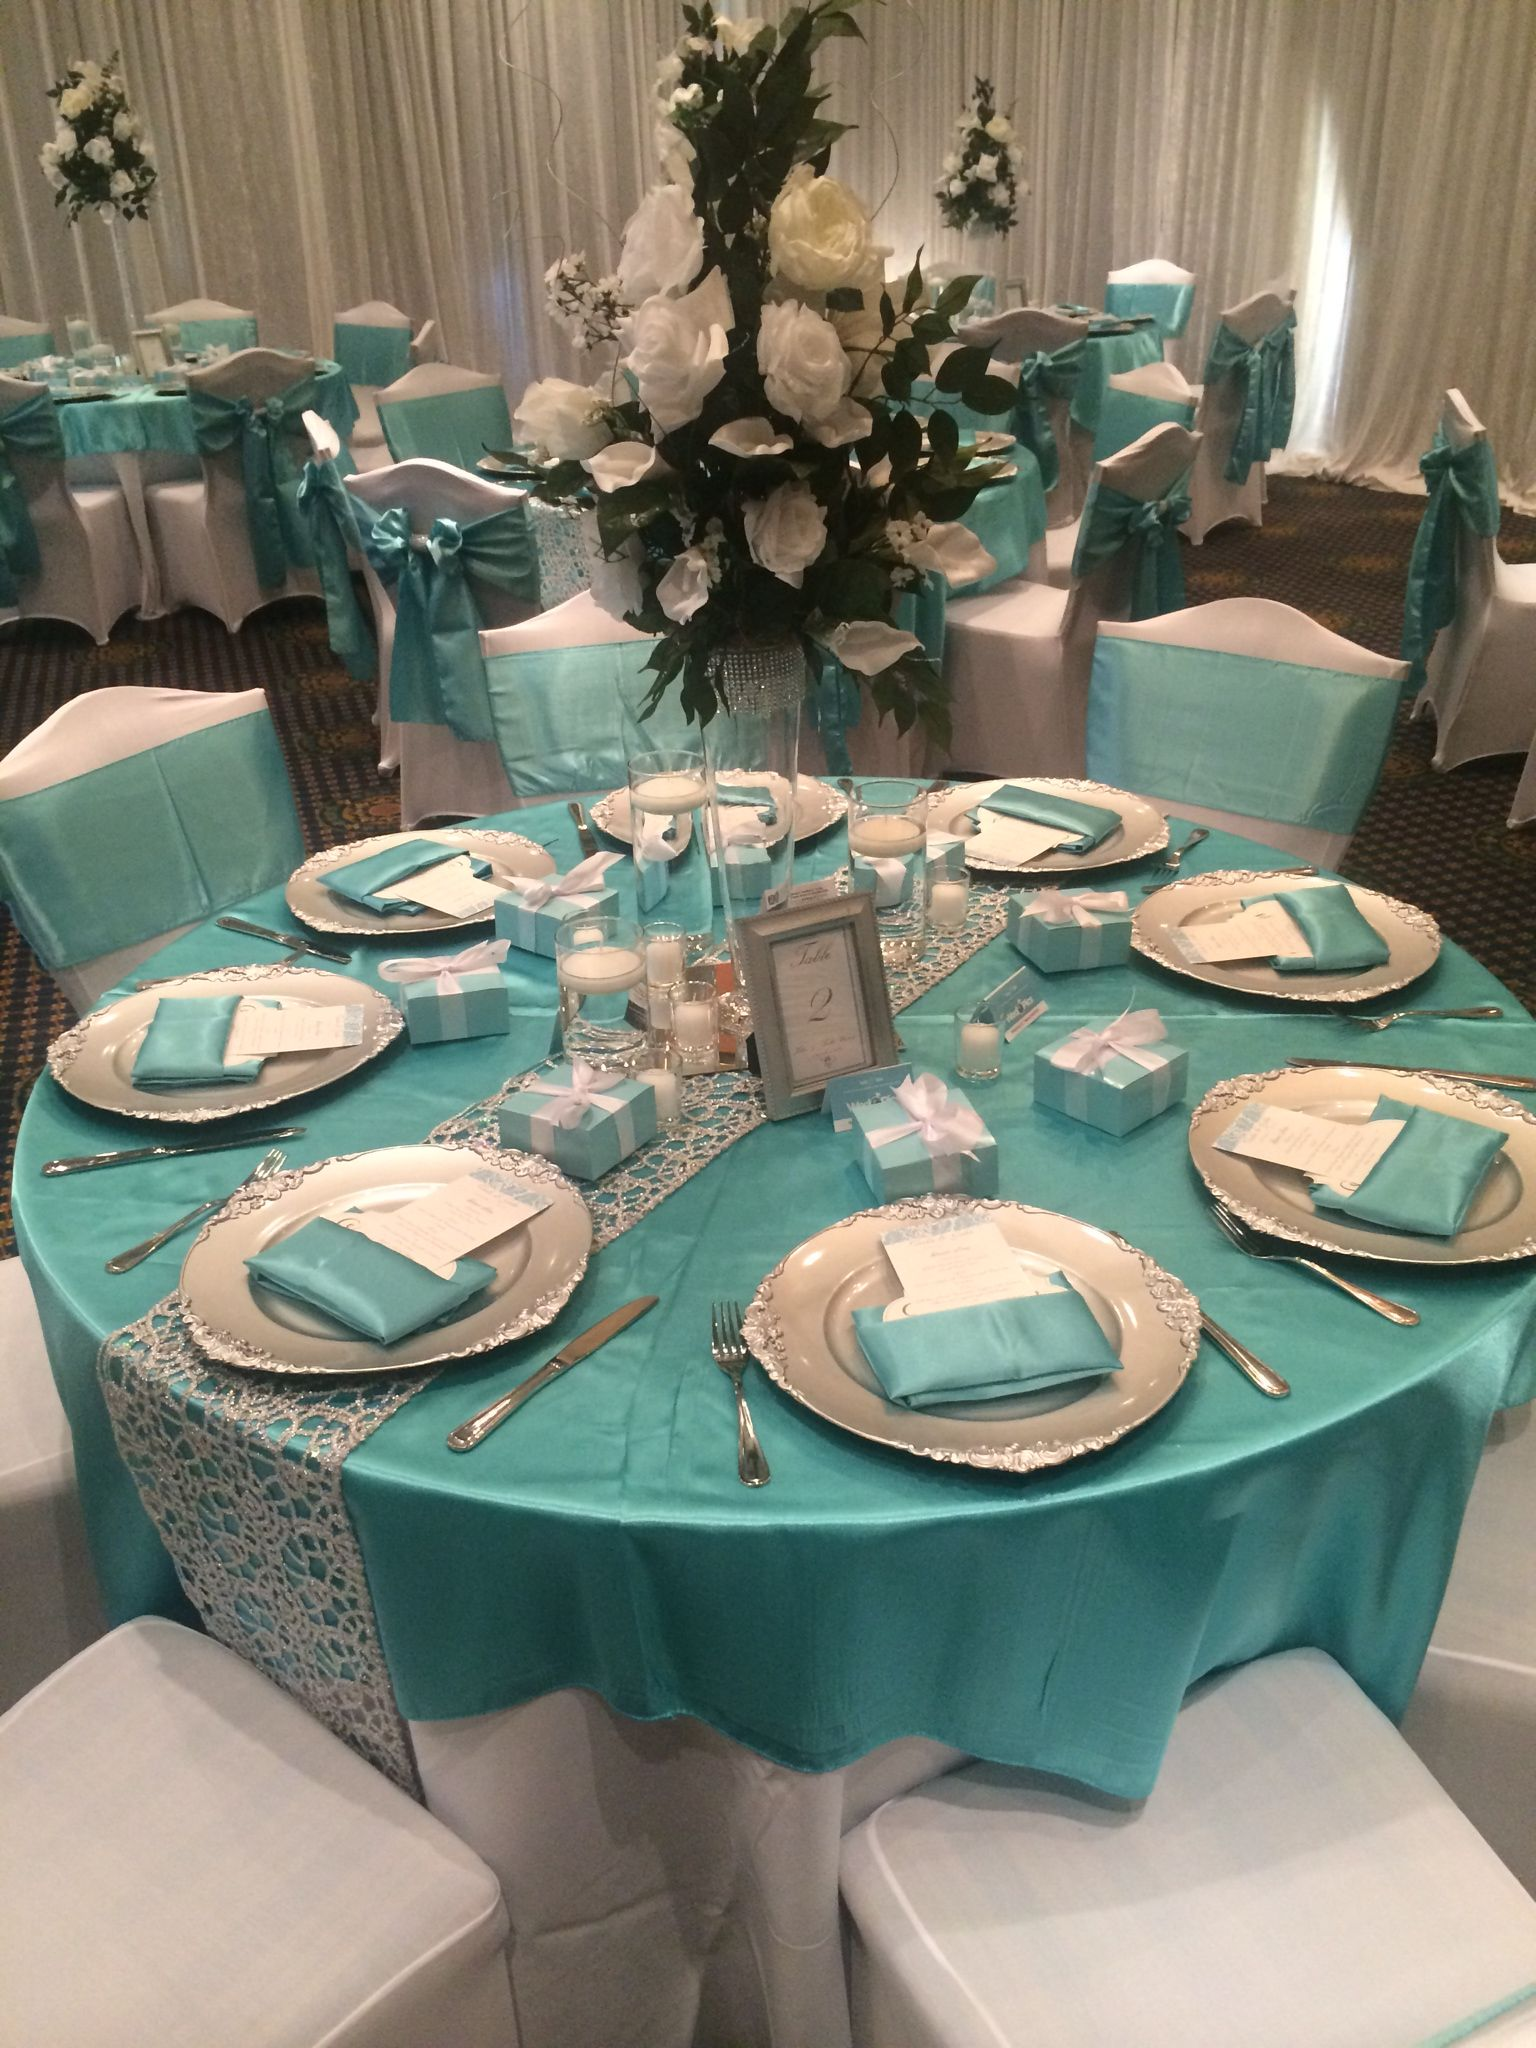 My 2nd Wedding Color Tiffany Blue Silver And Black Tiffany